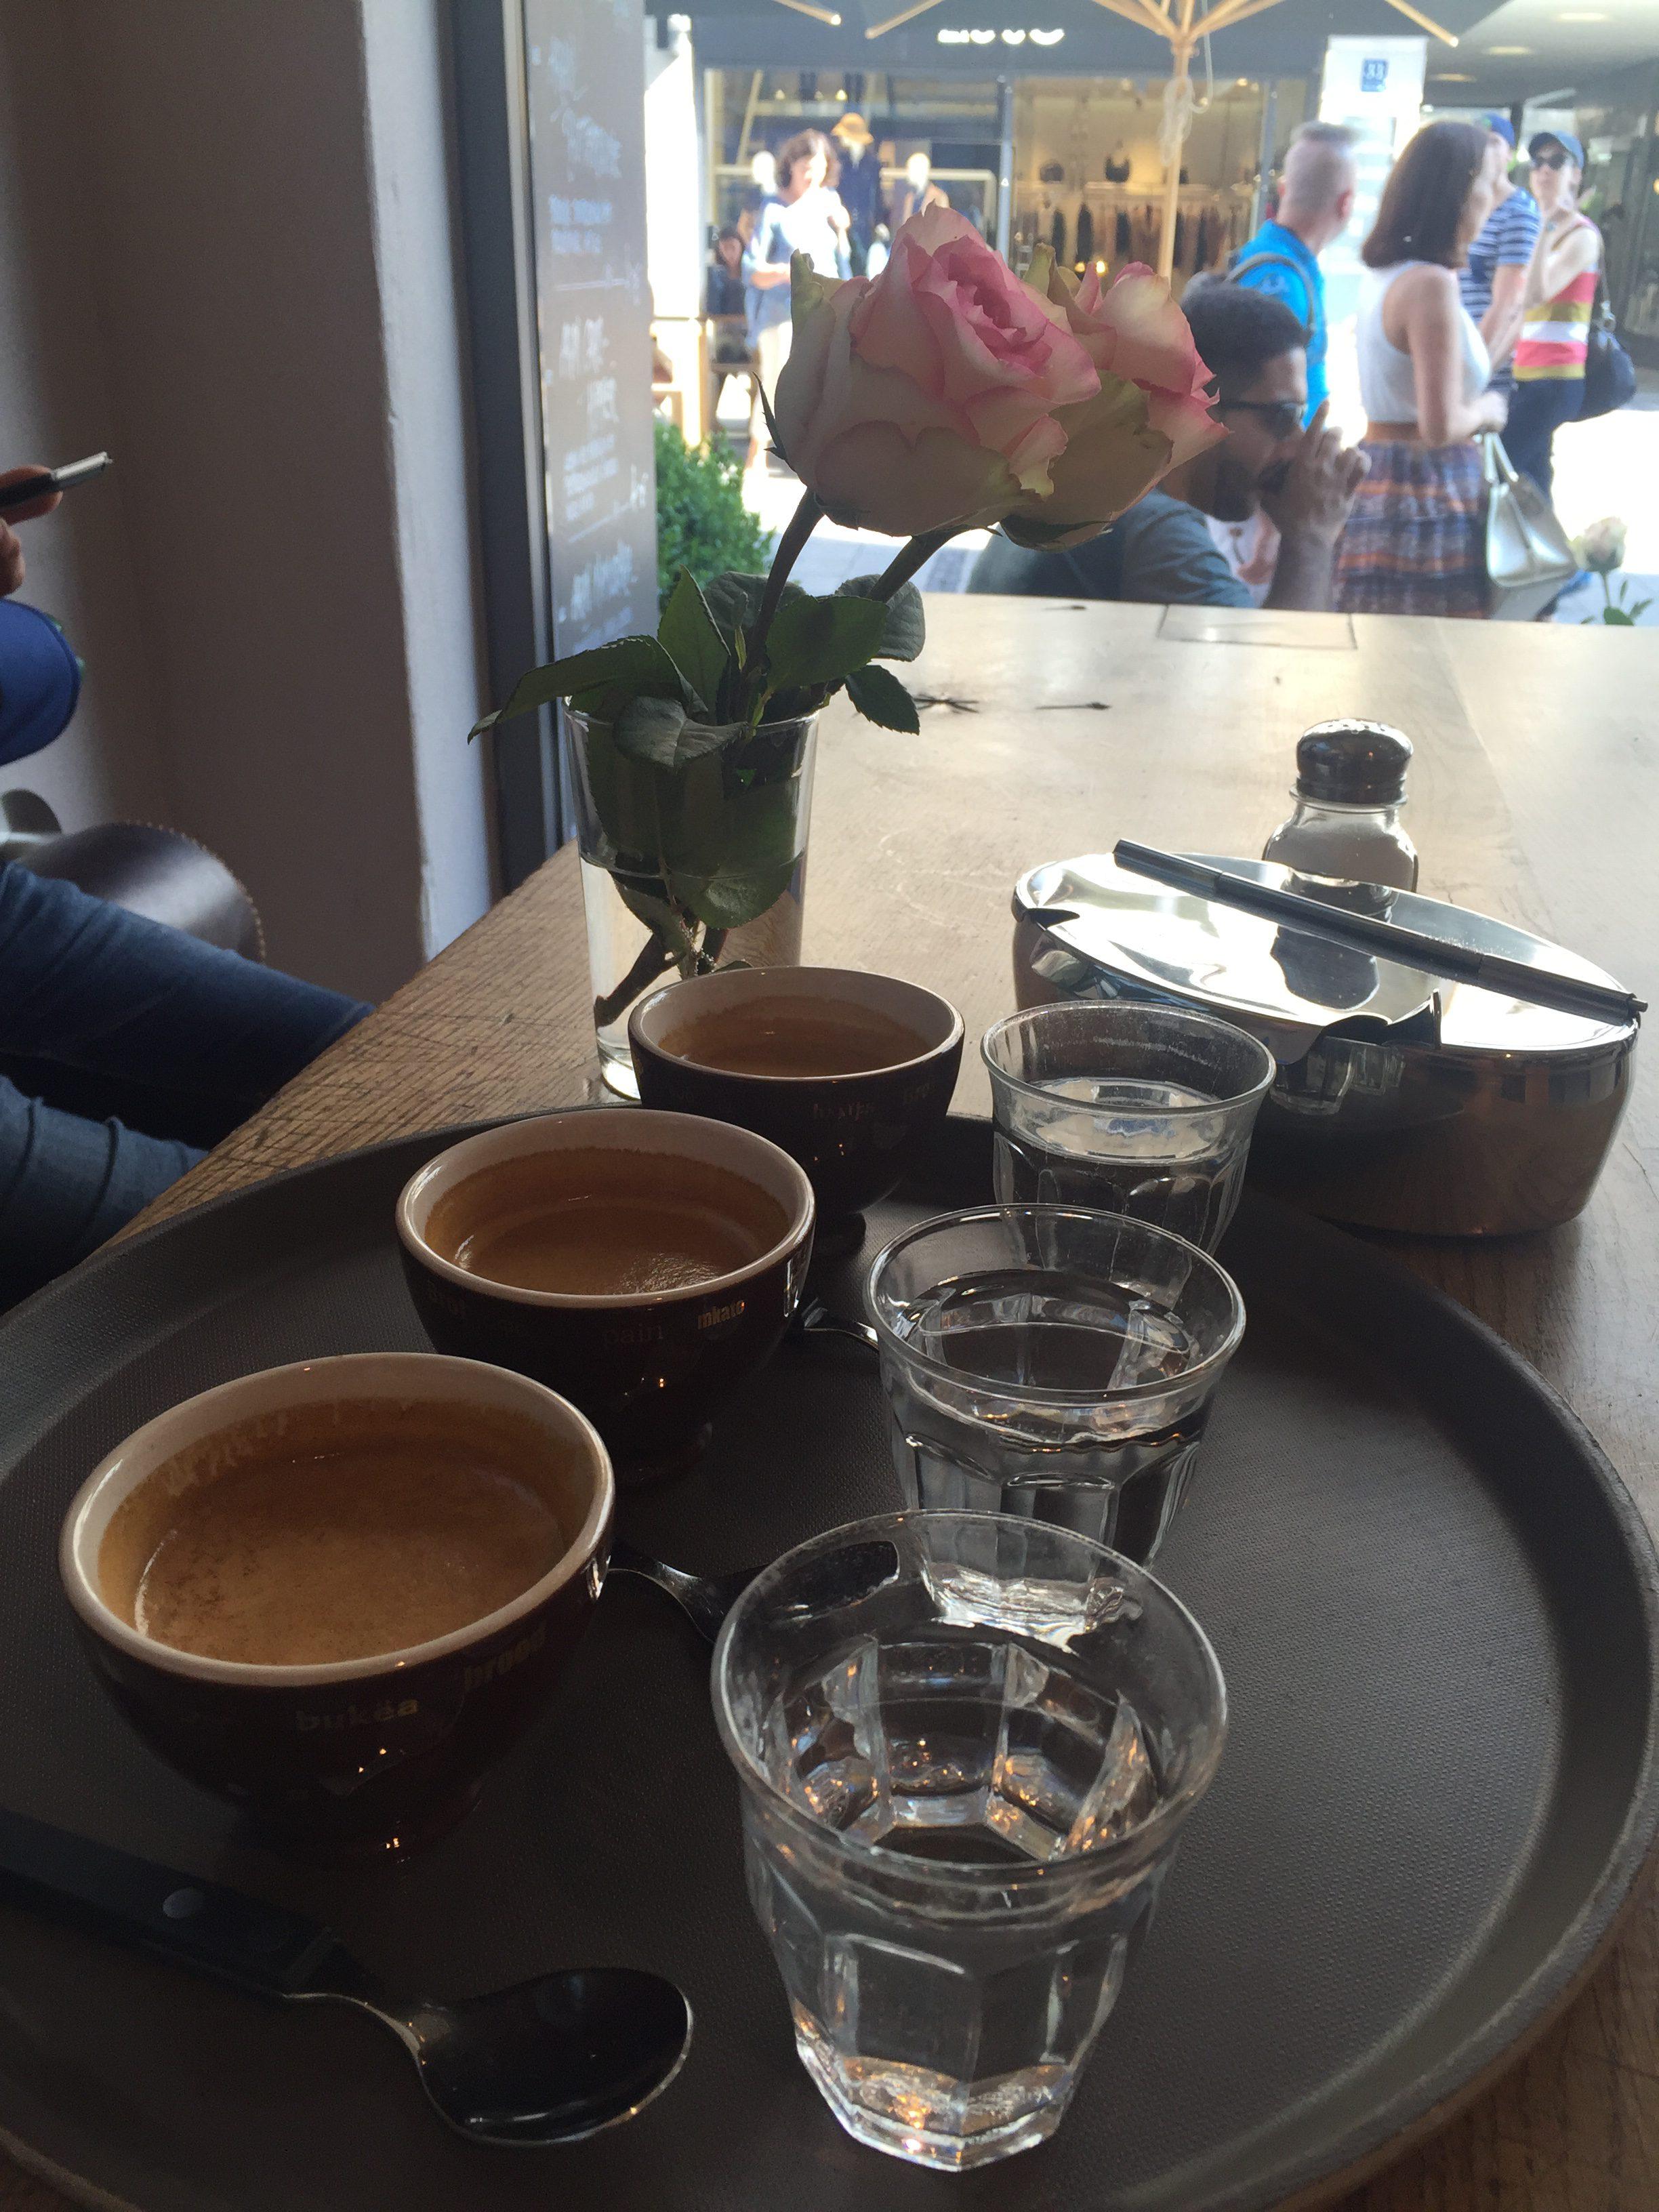 munchen, germany, deutschland, mnichov, roadtrip, travel, cestovanie, bmw spat ku korenom, tonychef, tony dubravec, aran, coffee